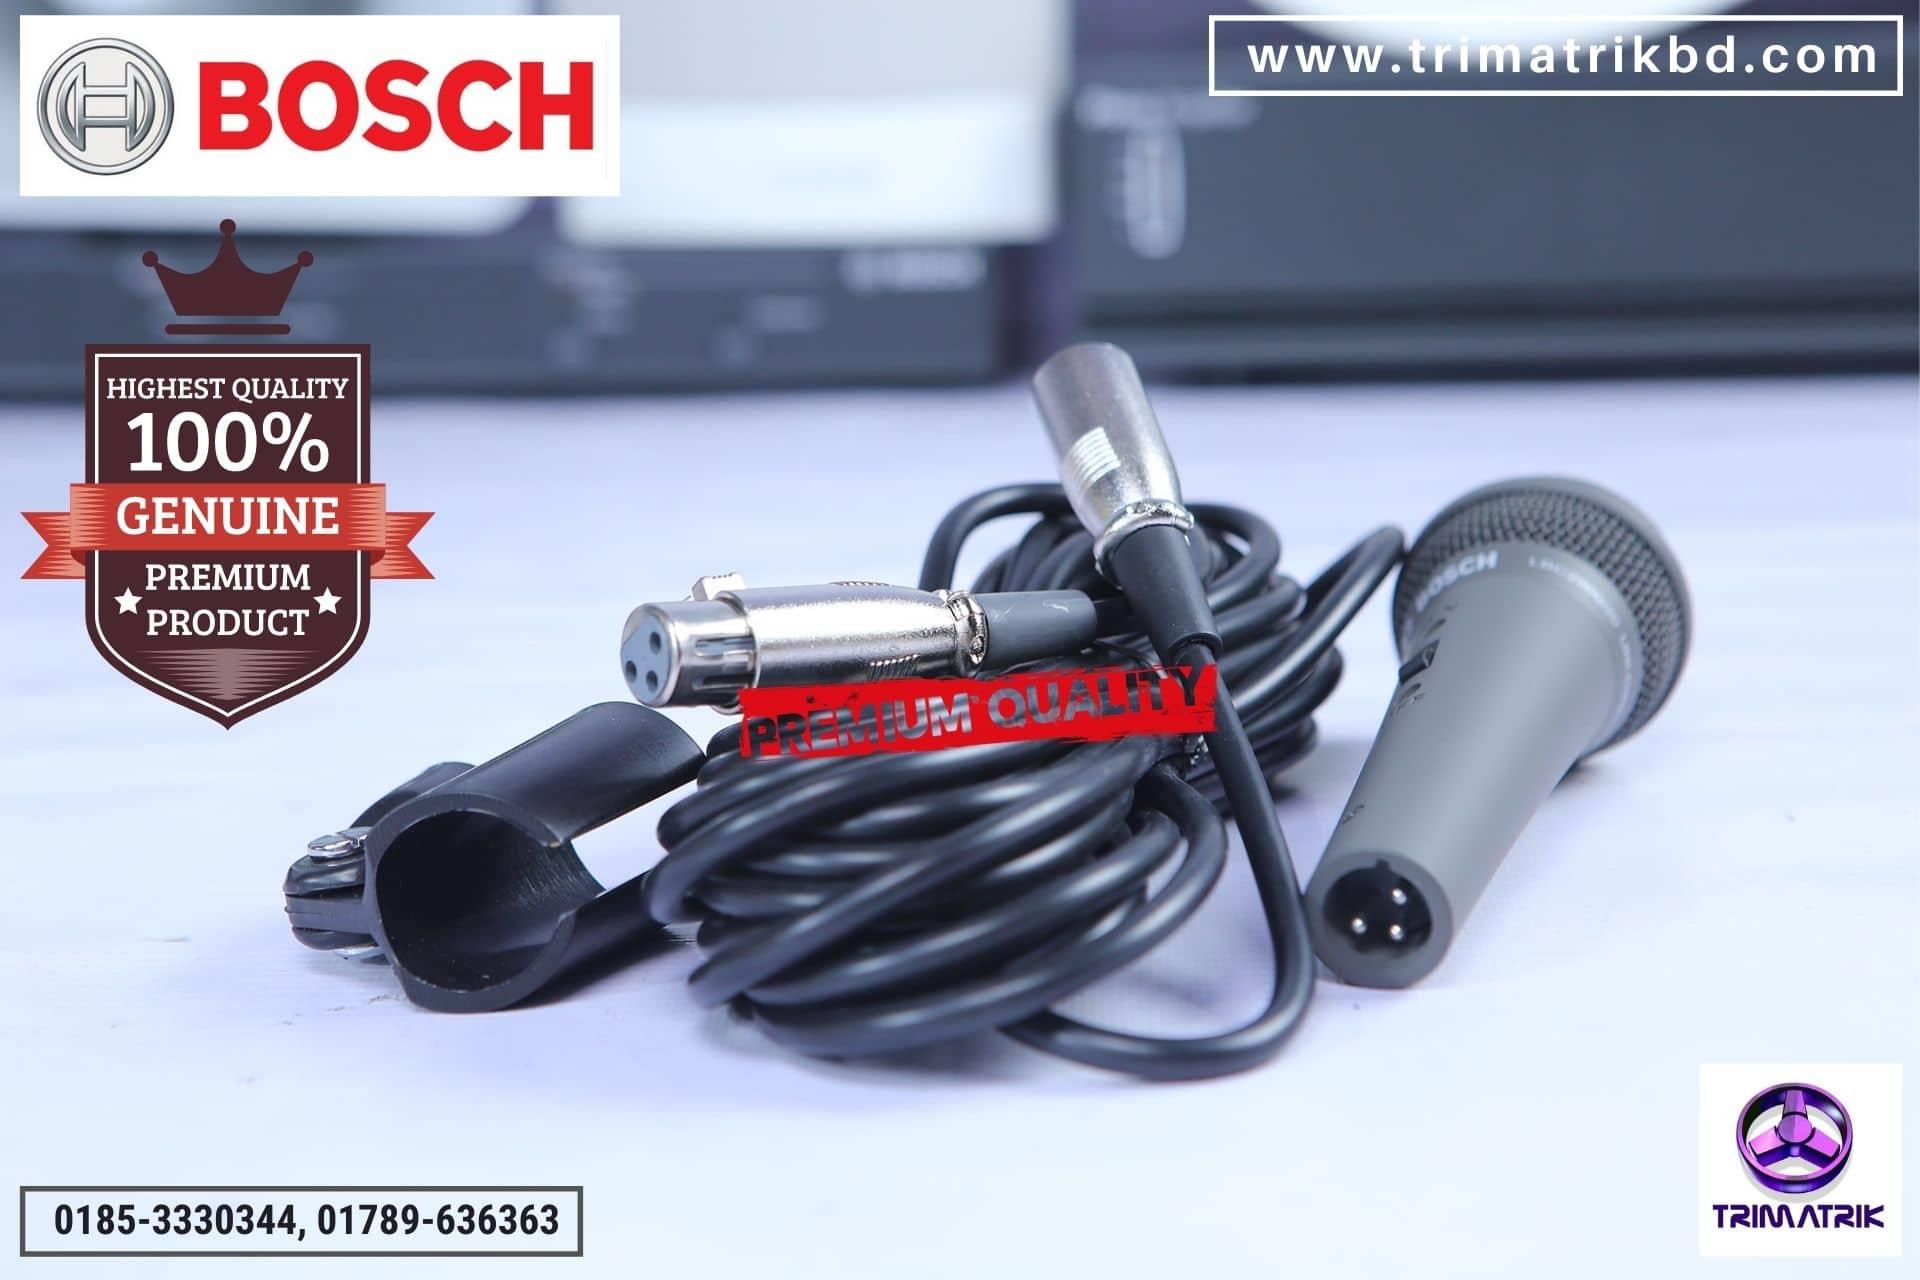 Bosch LBC 2900/20 Bangladesh